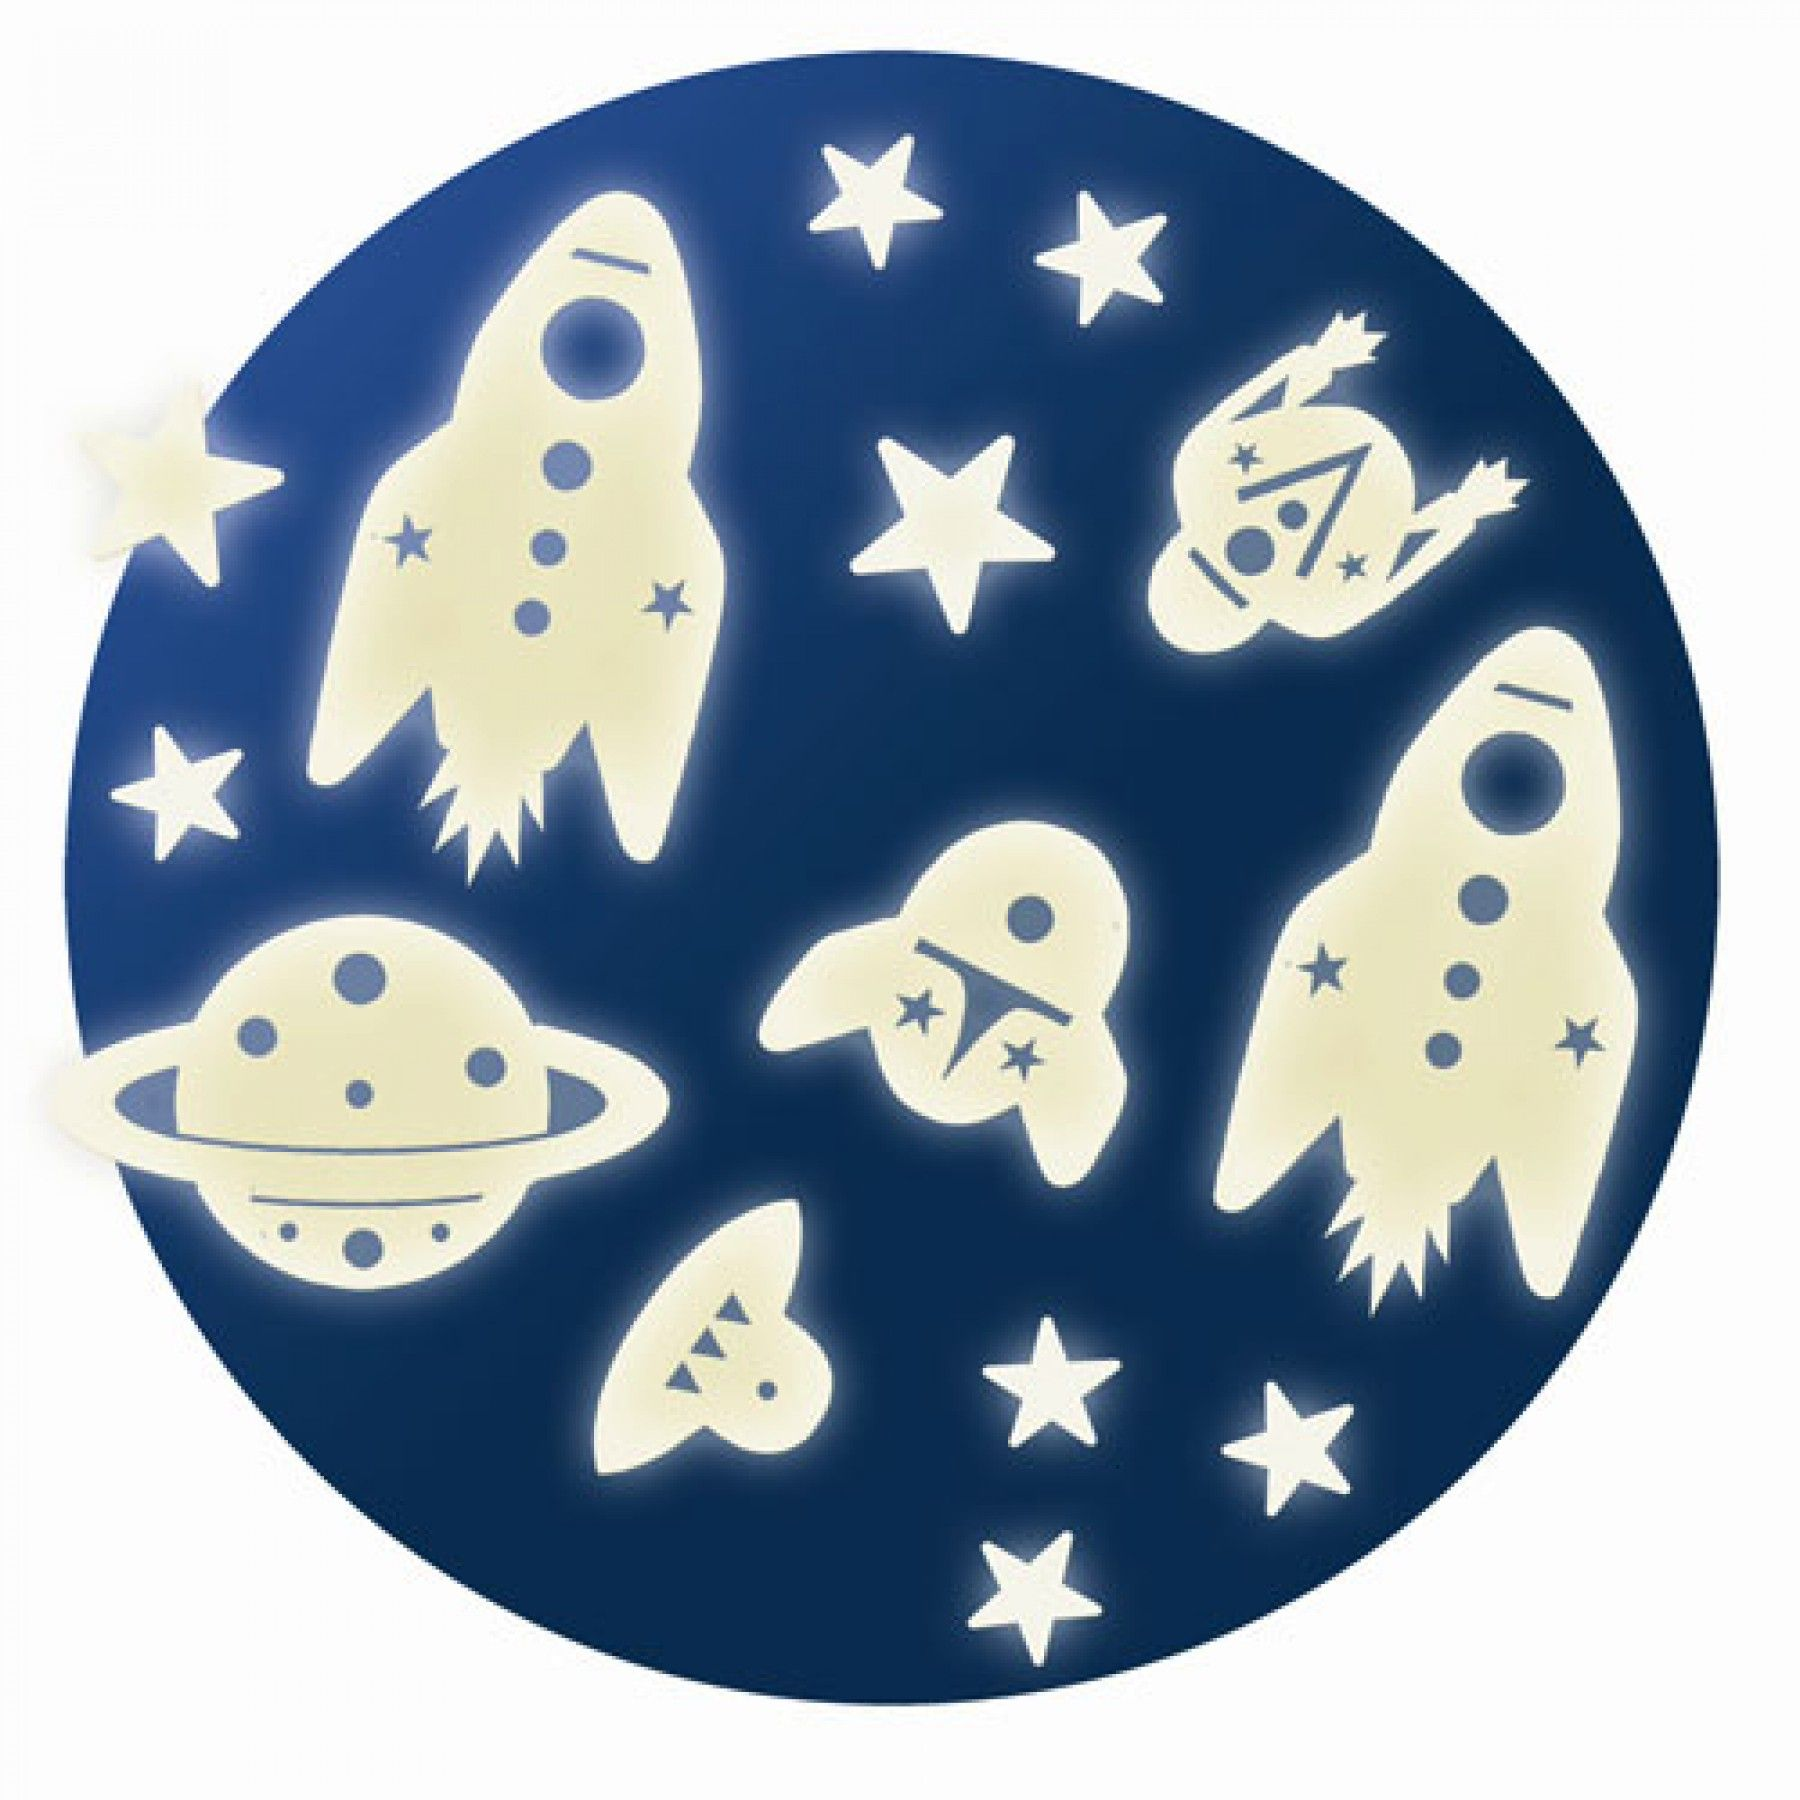 Figuras fosforescentes Mision Espacial